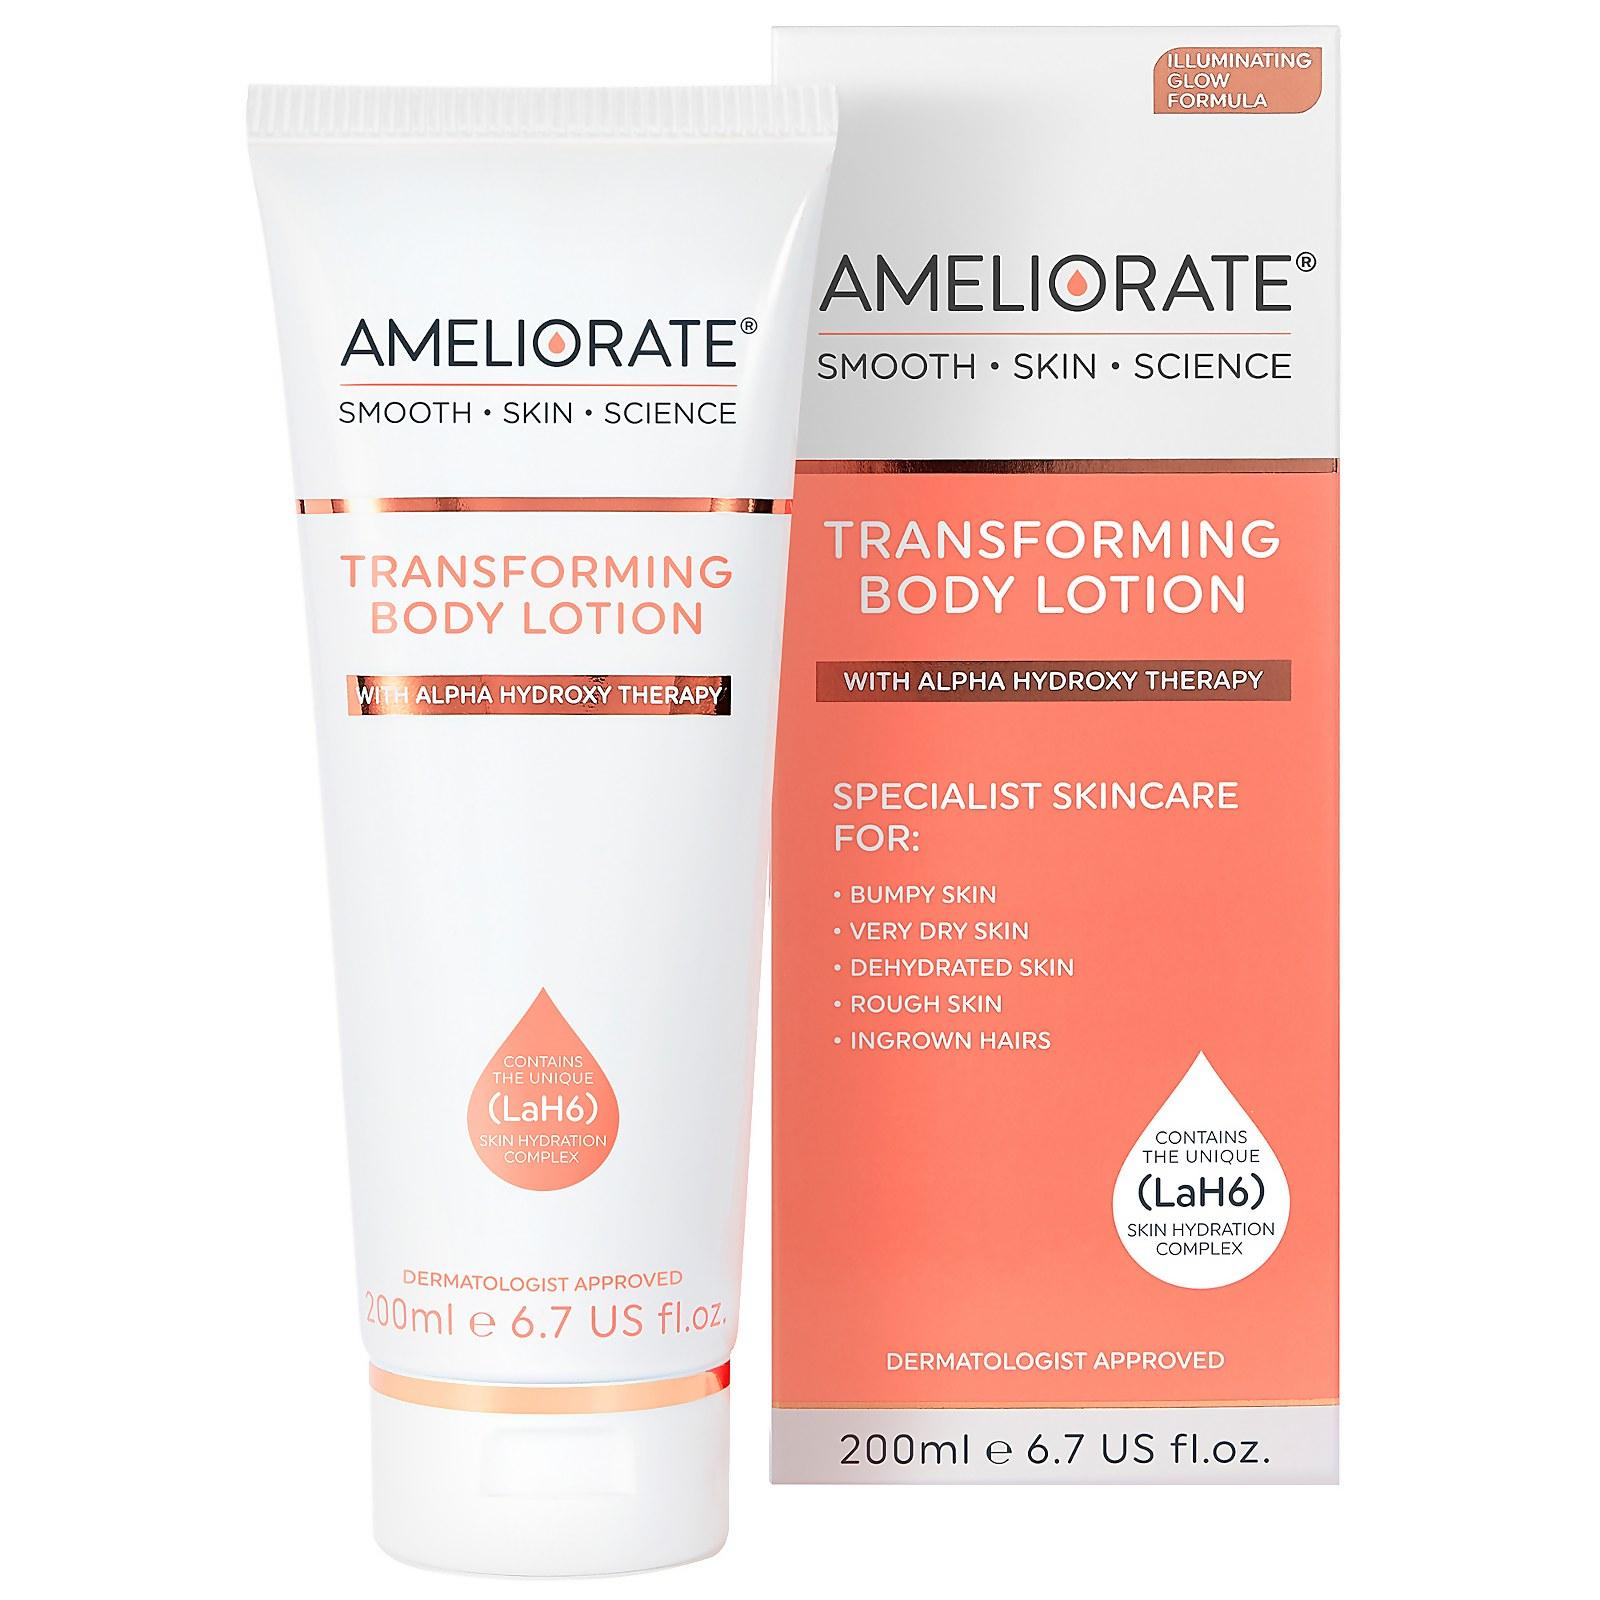 Ameliorate Transforming Body Lotion Illuminating Glow